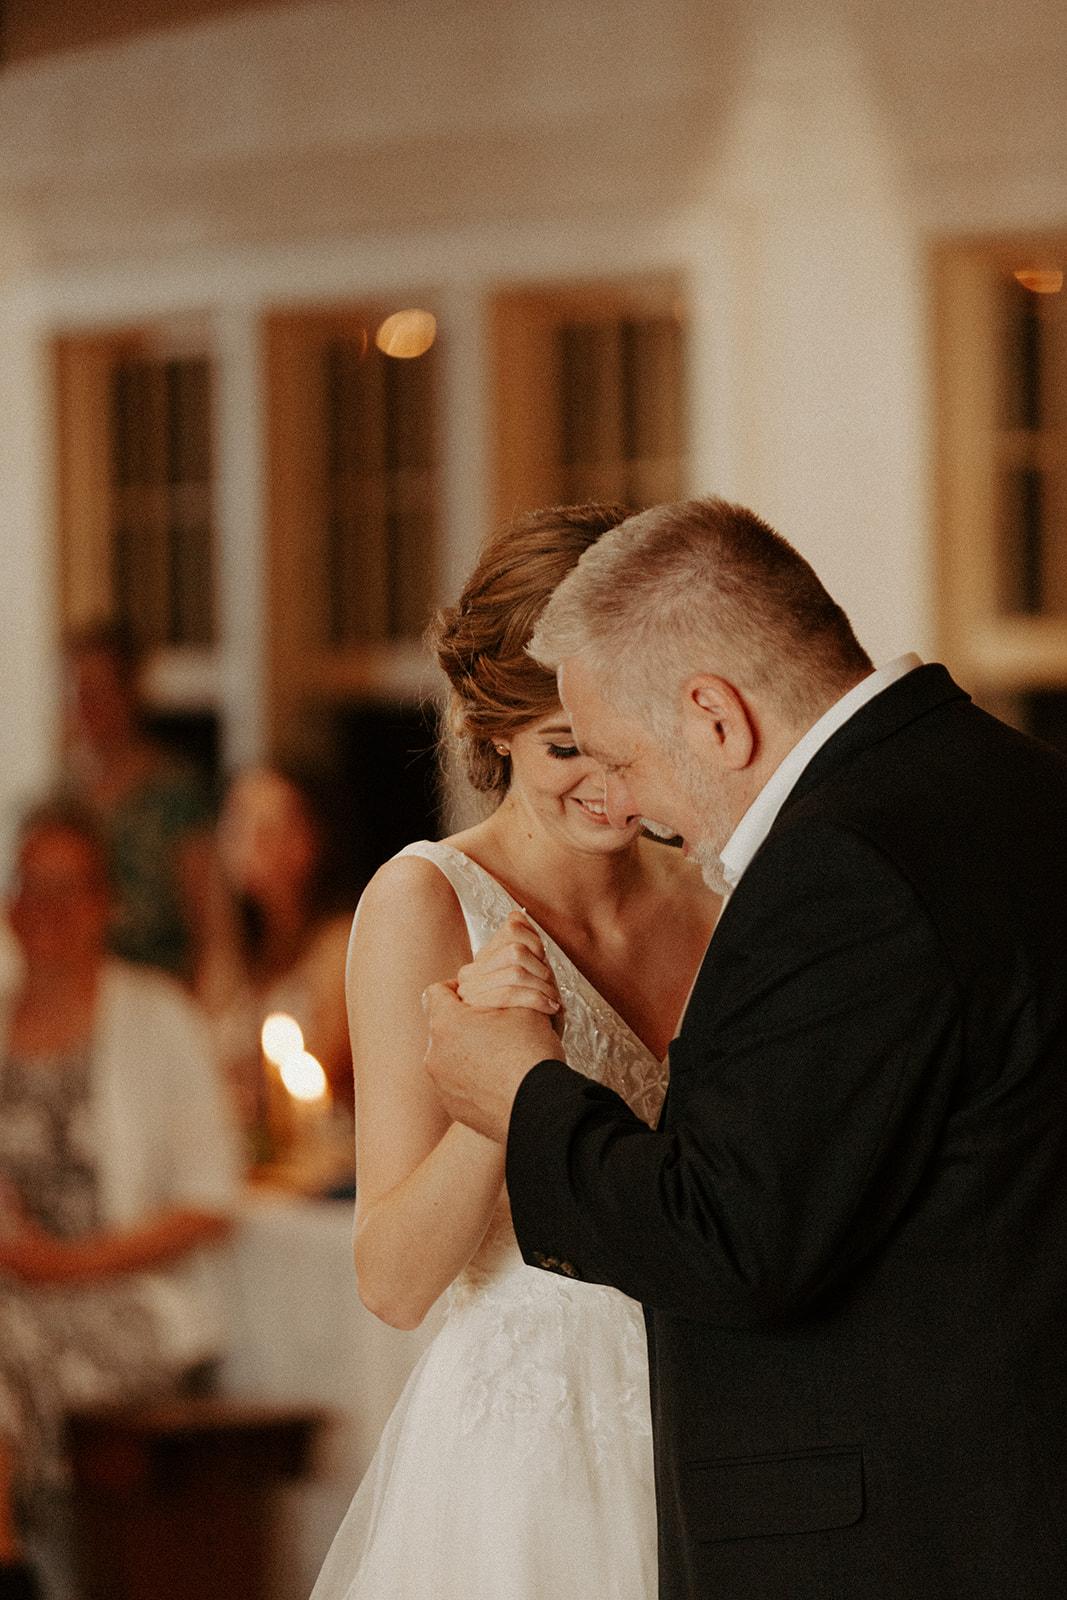 camp_wokanda_peoria_illinois_wedding_photographer_wright_photographs_bliese_0972.jpg